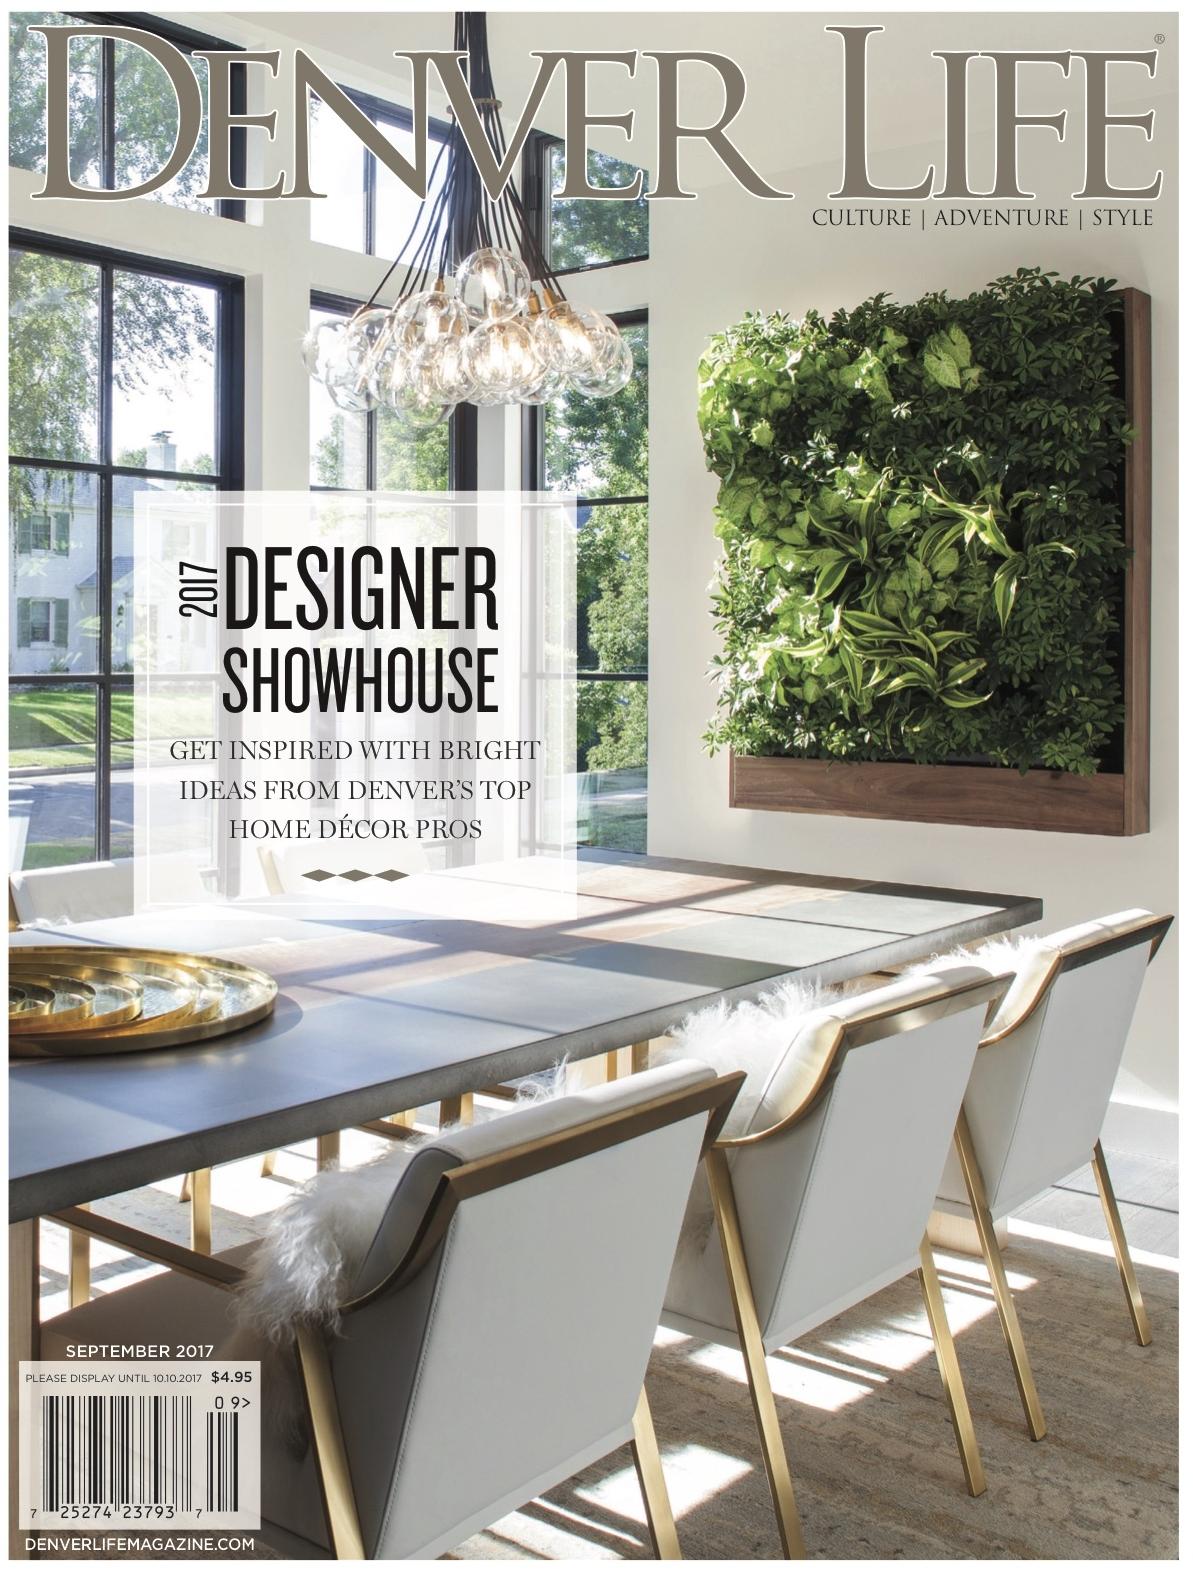 Sept 2017  Denver Life Home + Design   Designer Showhouse- Kitchen & Butler's Pantry